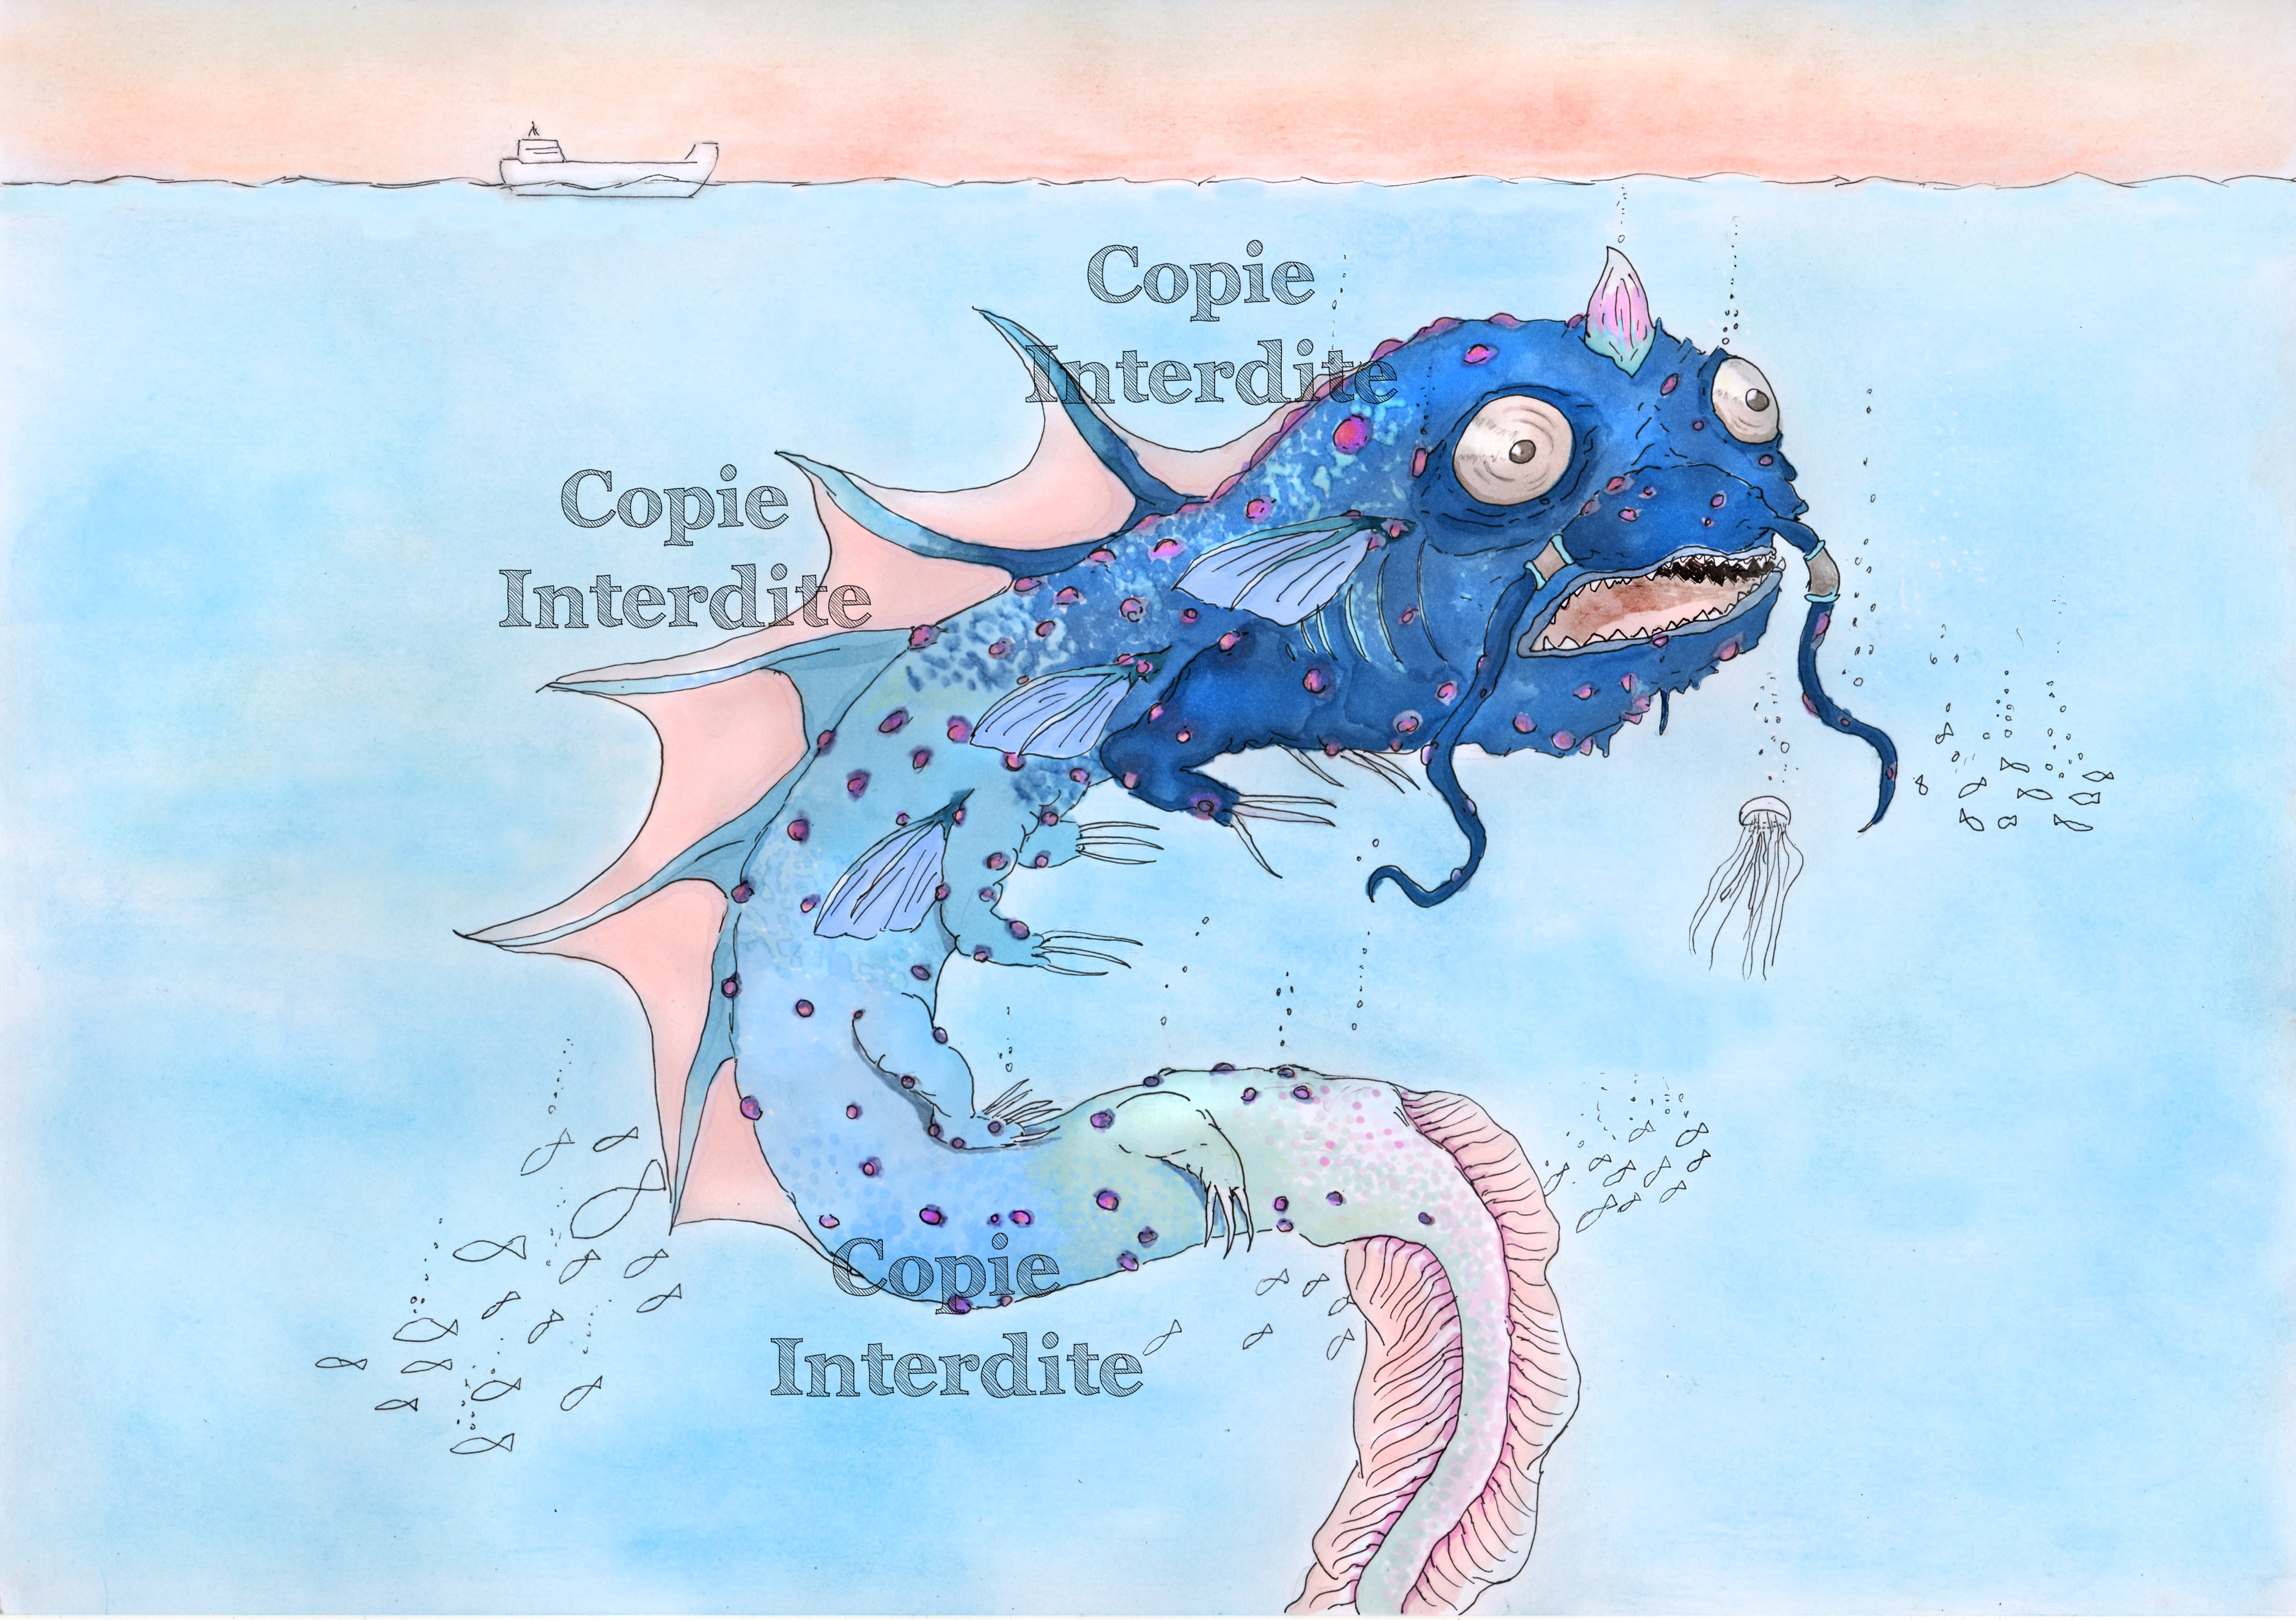 créature marine